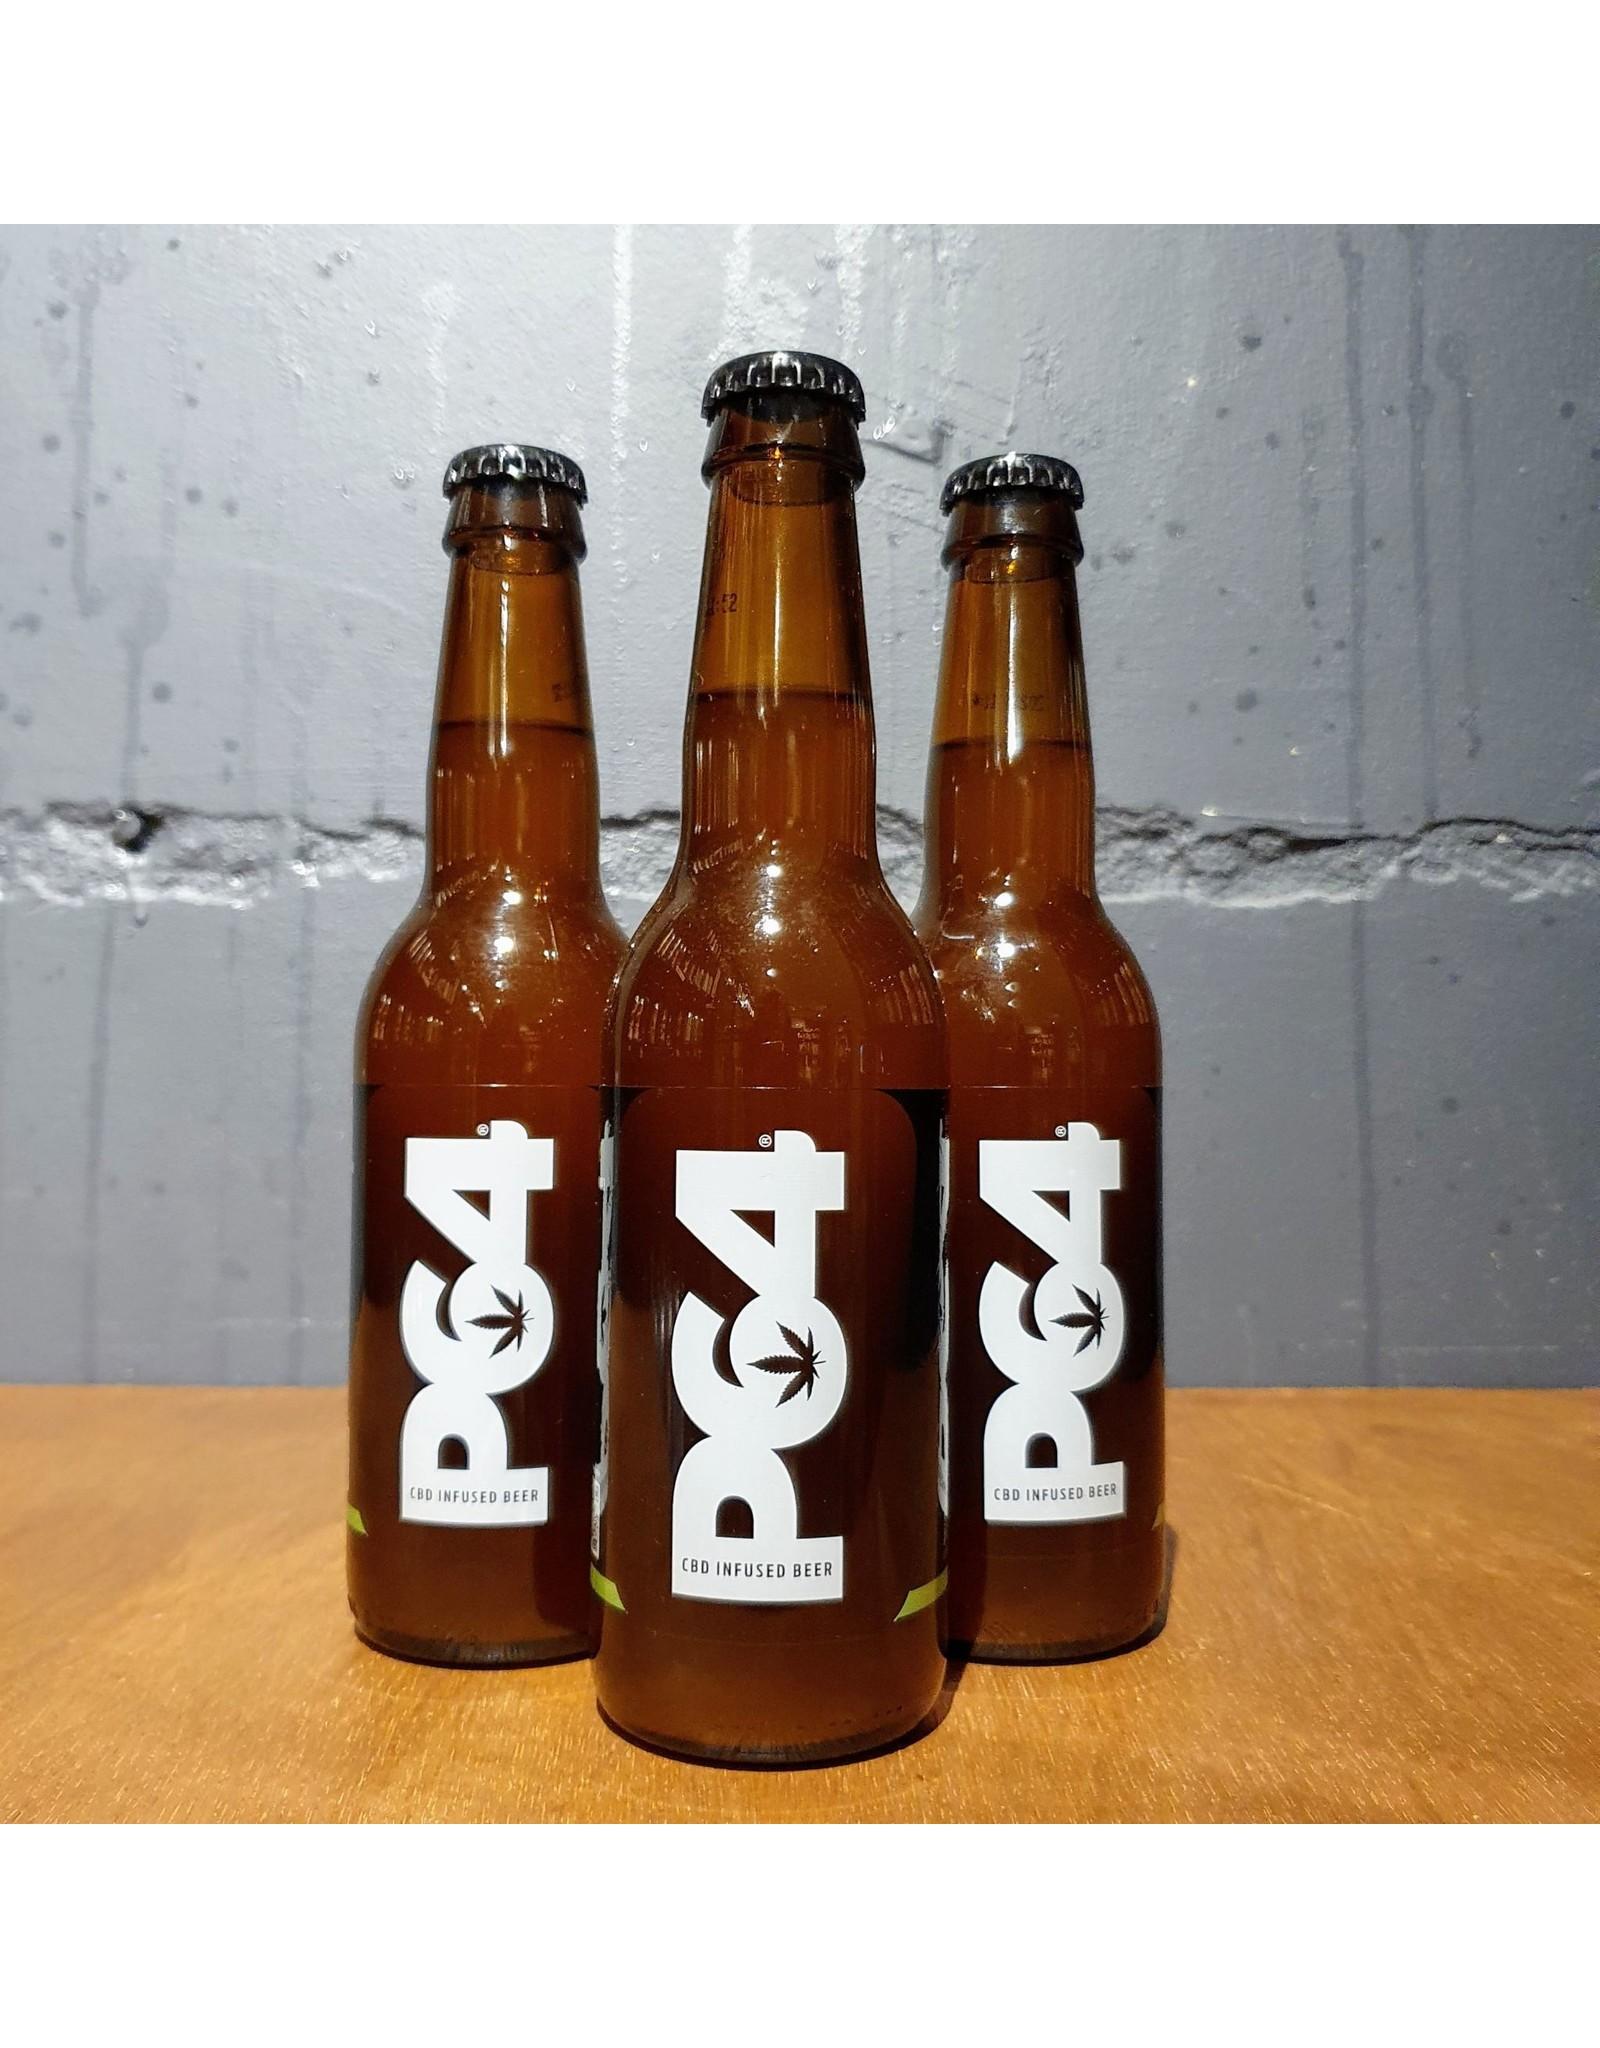 P64: CBD Infused Beer 0.5%